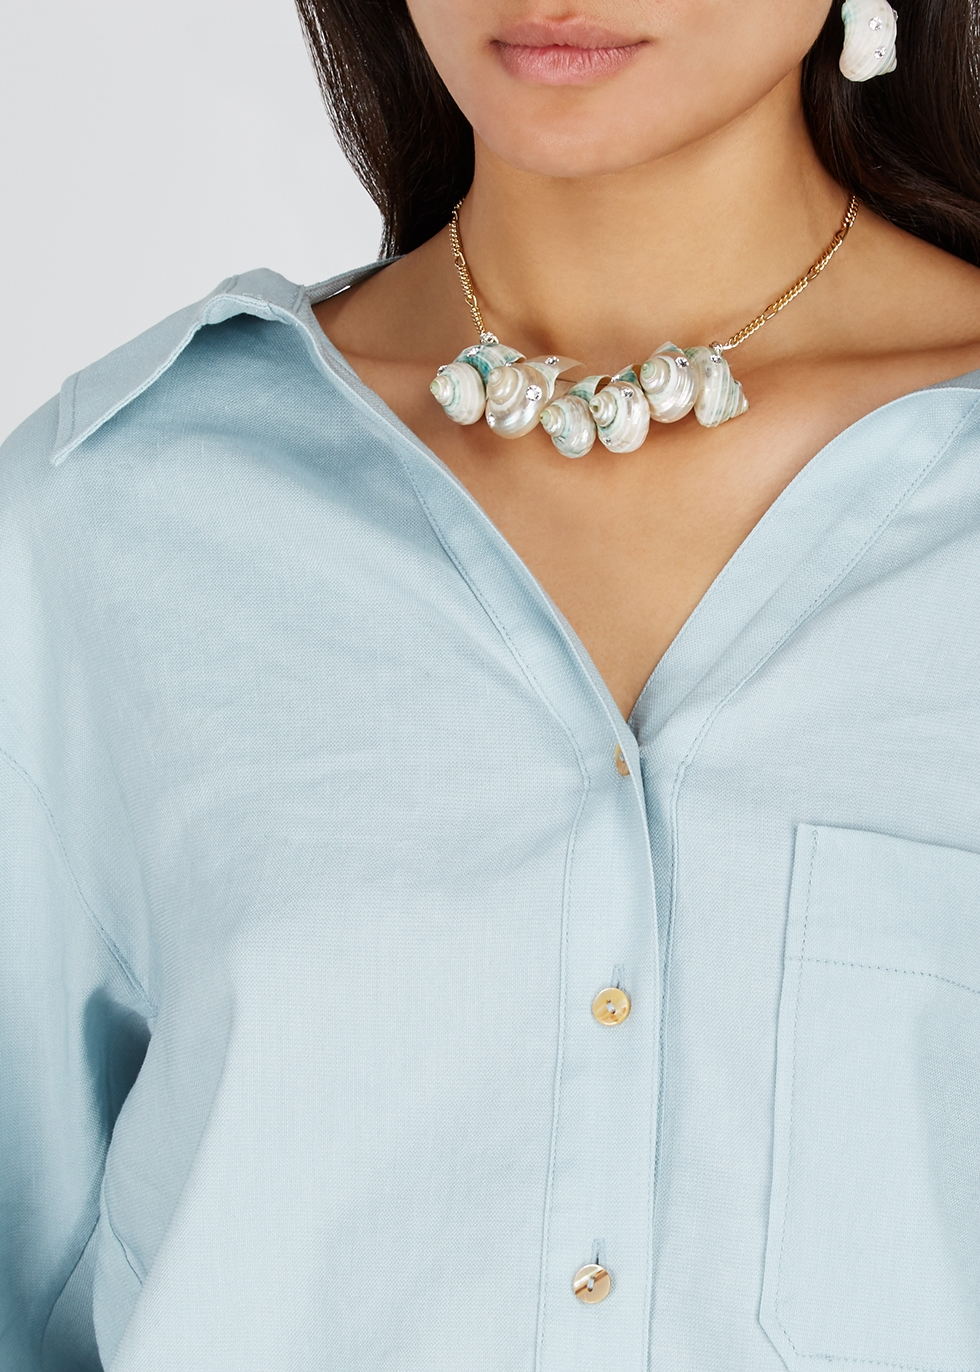 Paris Paris shell gold-plated necklace - WALD Berlin